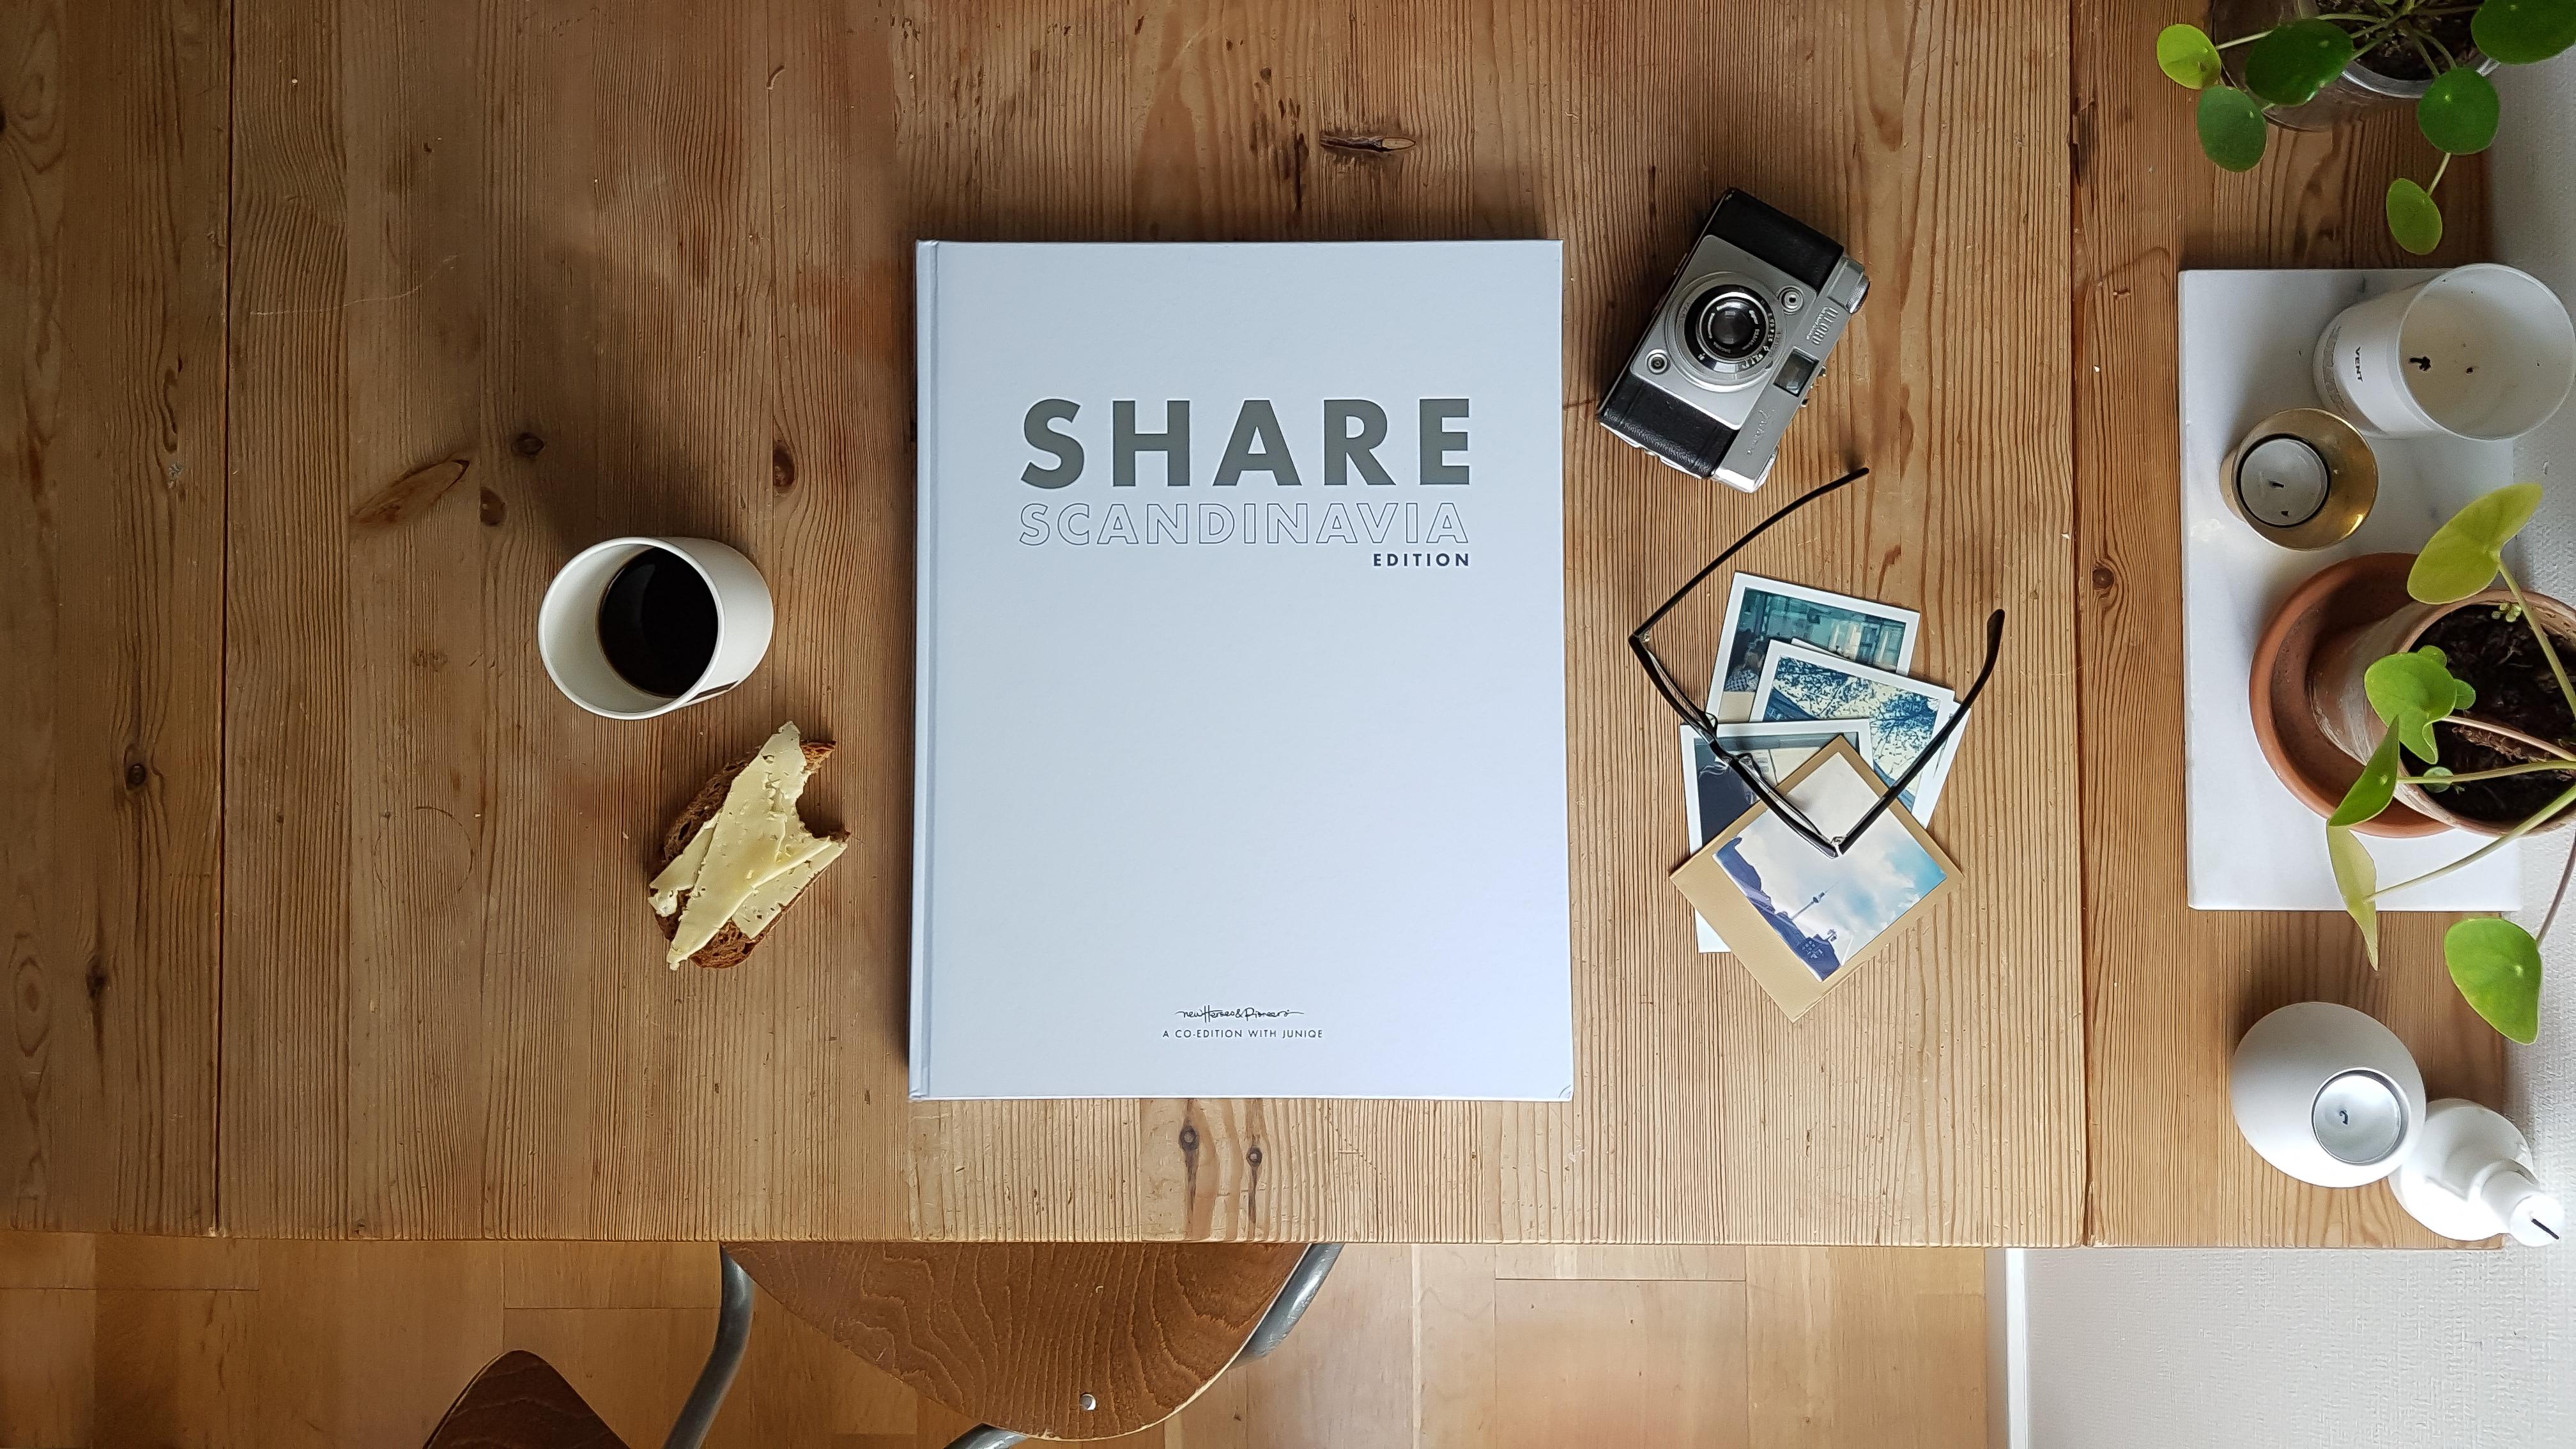 Share Scandinavia